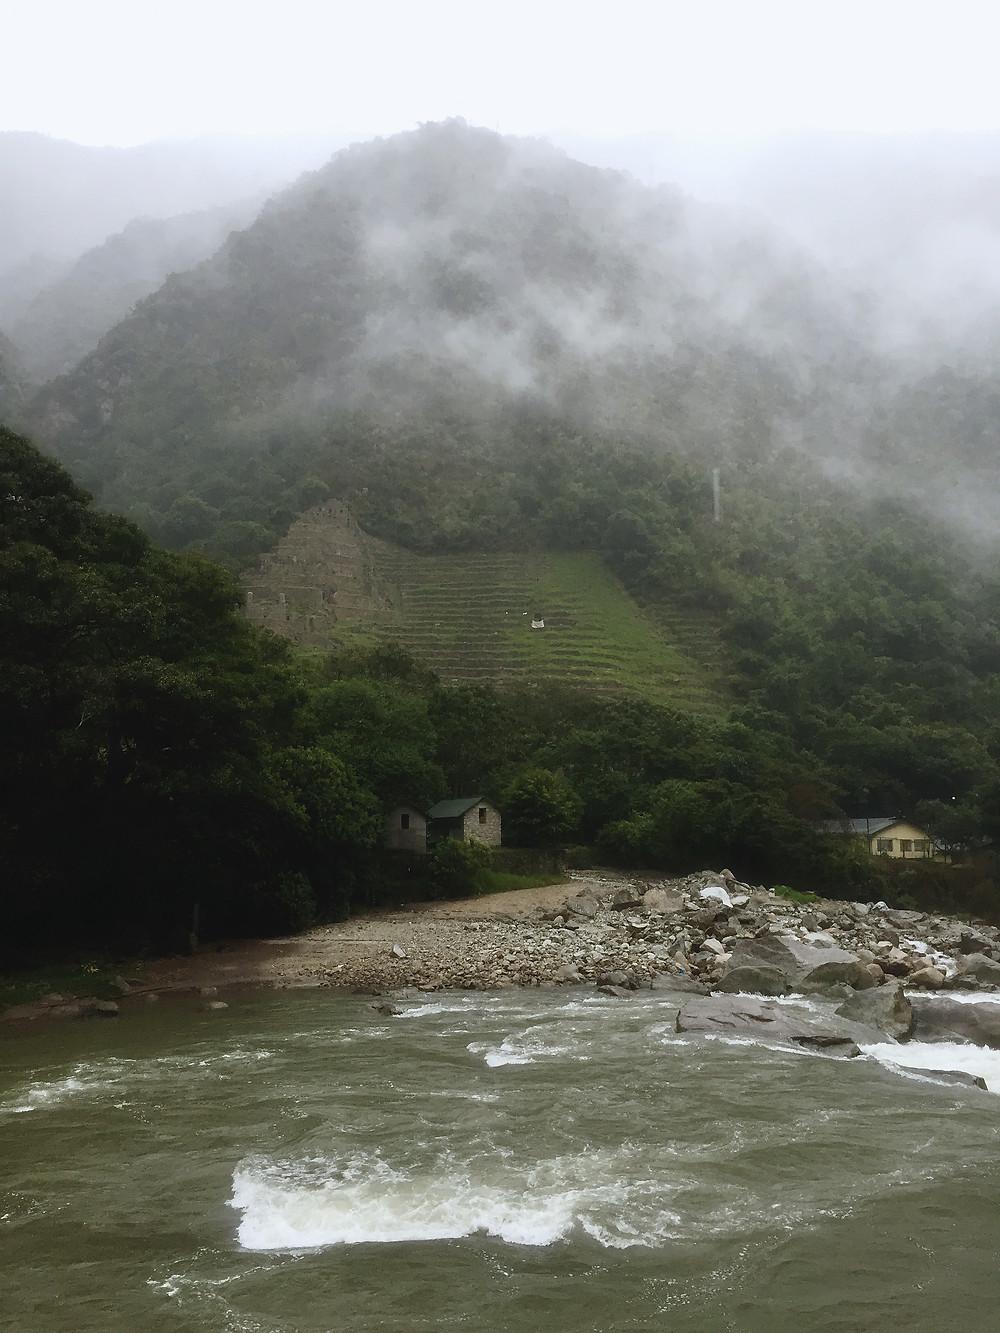 Along Urubamba river